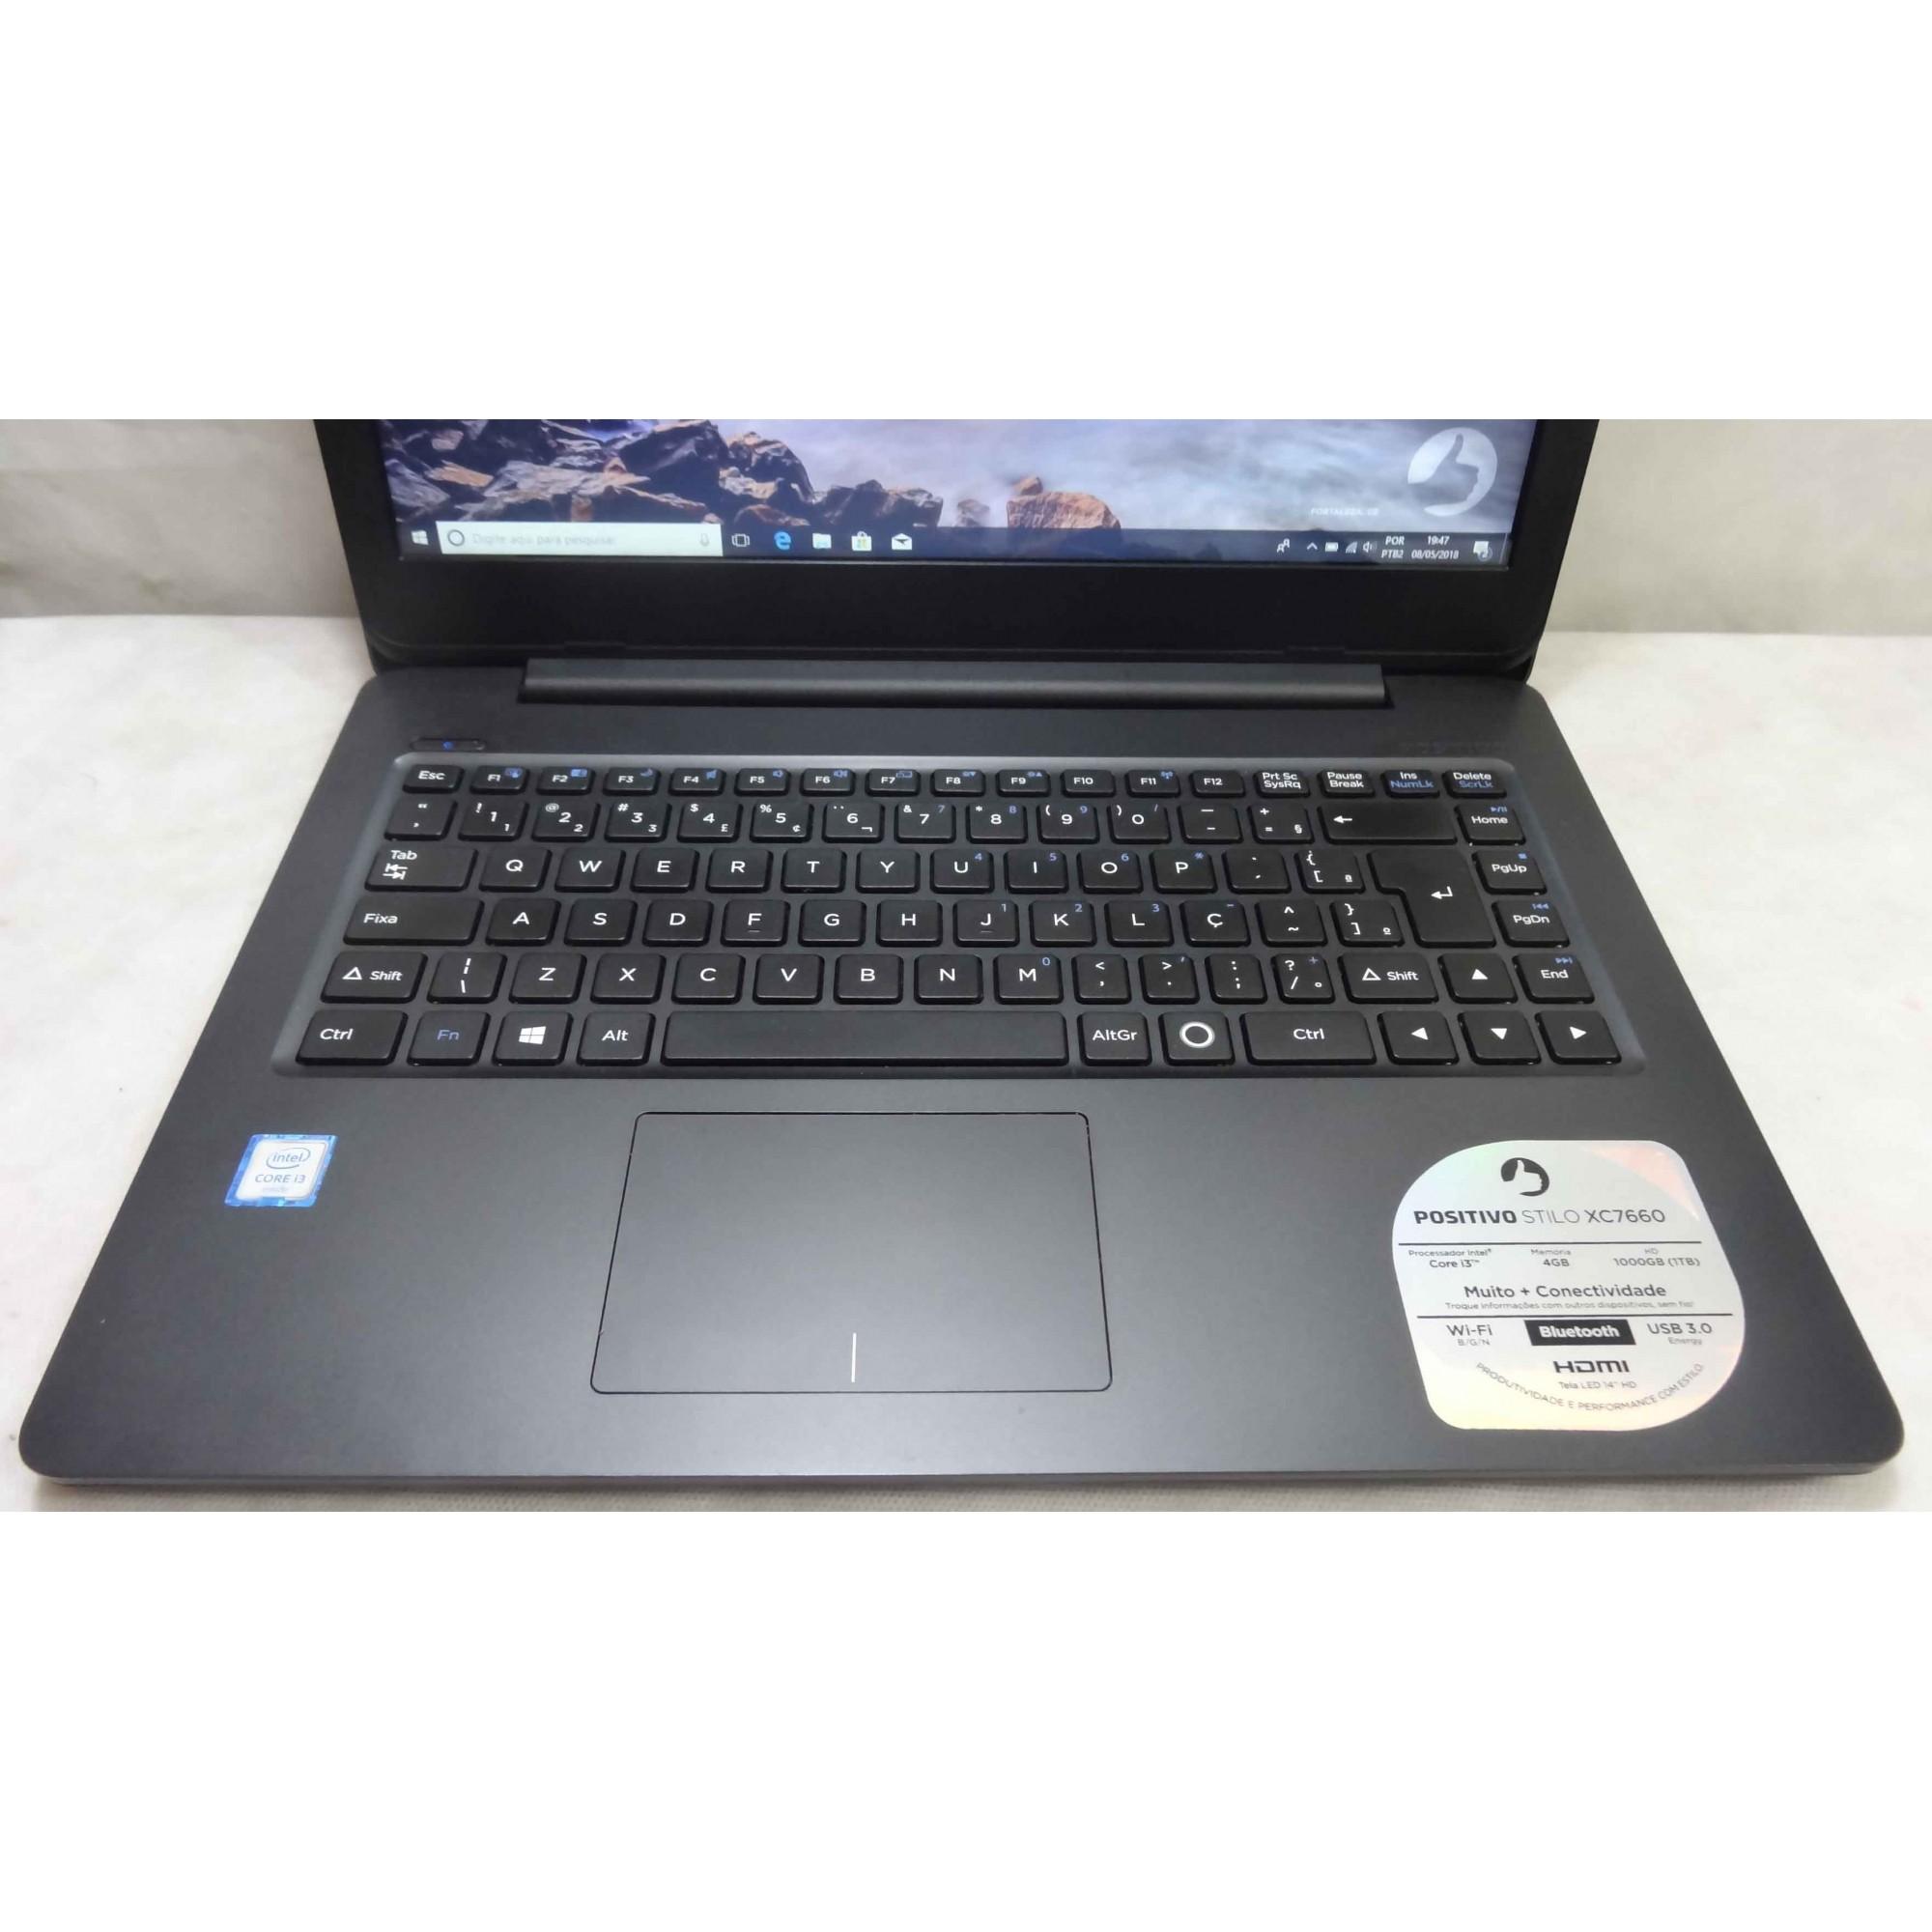 Notebook Positivo Stilo XC7660 Intel Core i3 2.3GHz 4GB HD-500GB